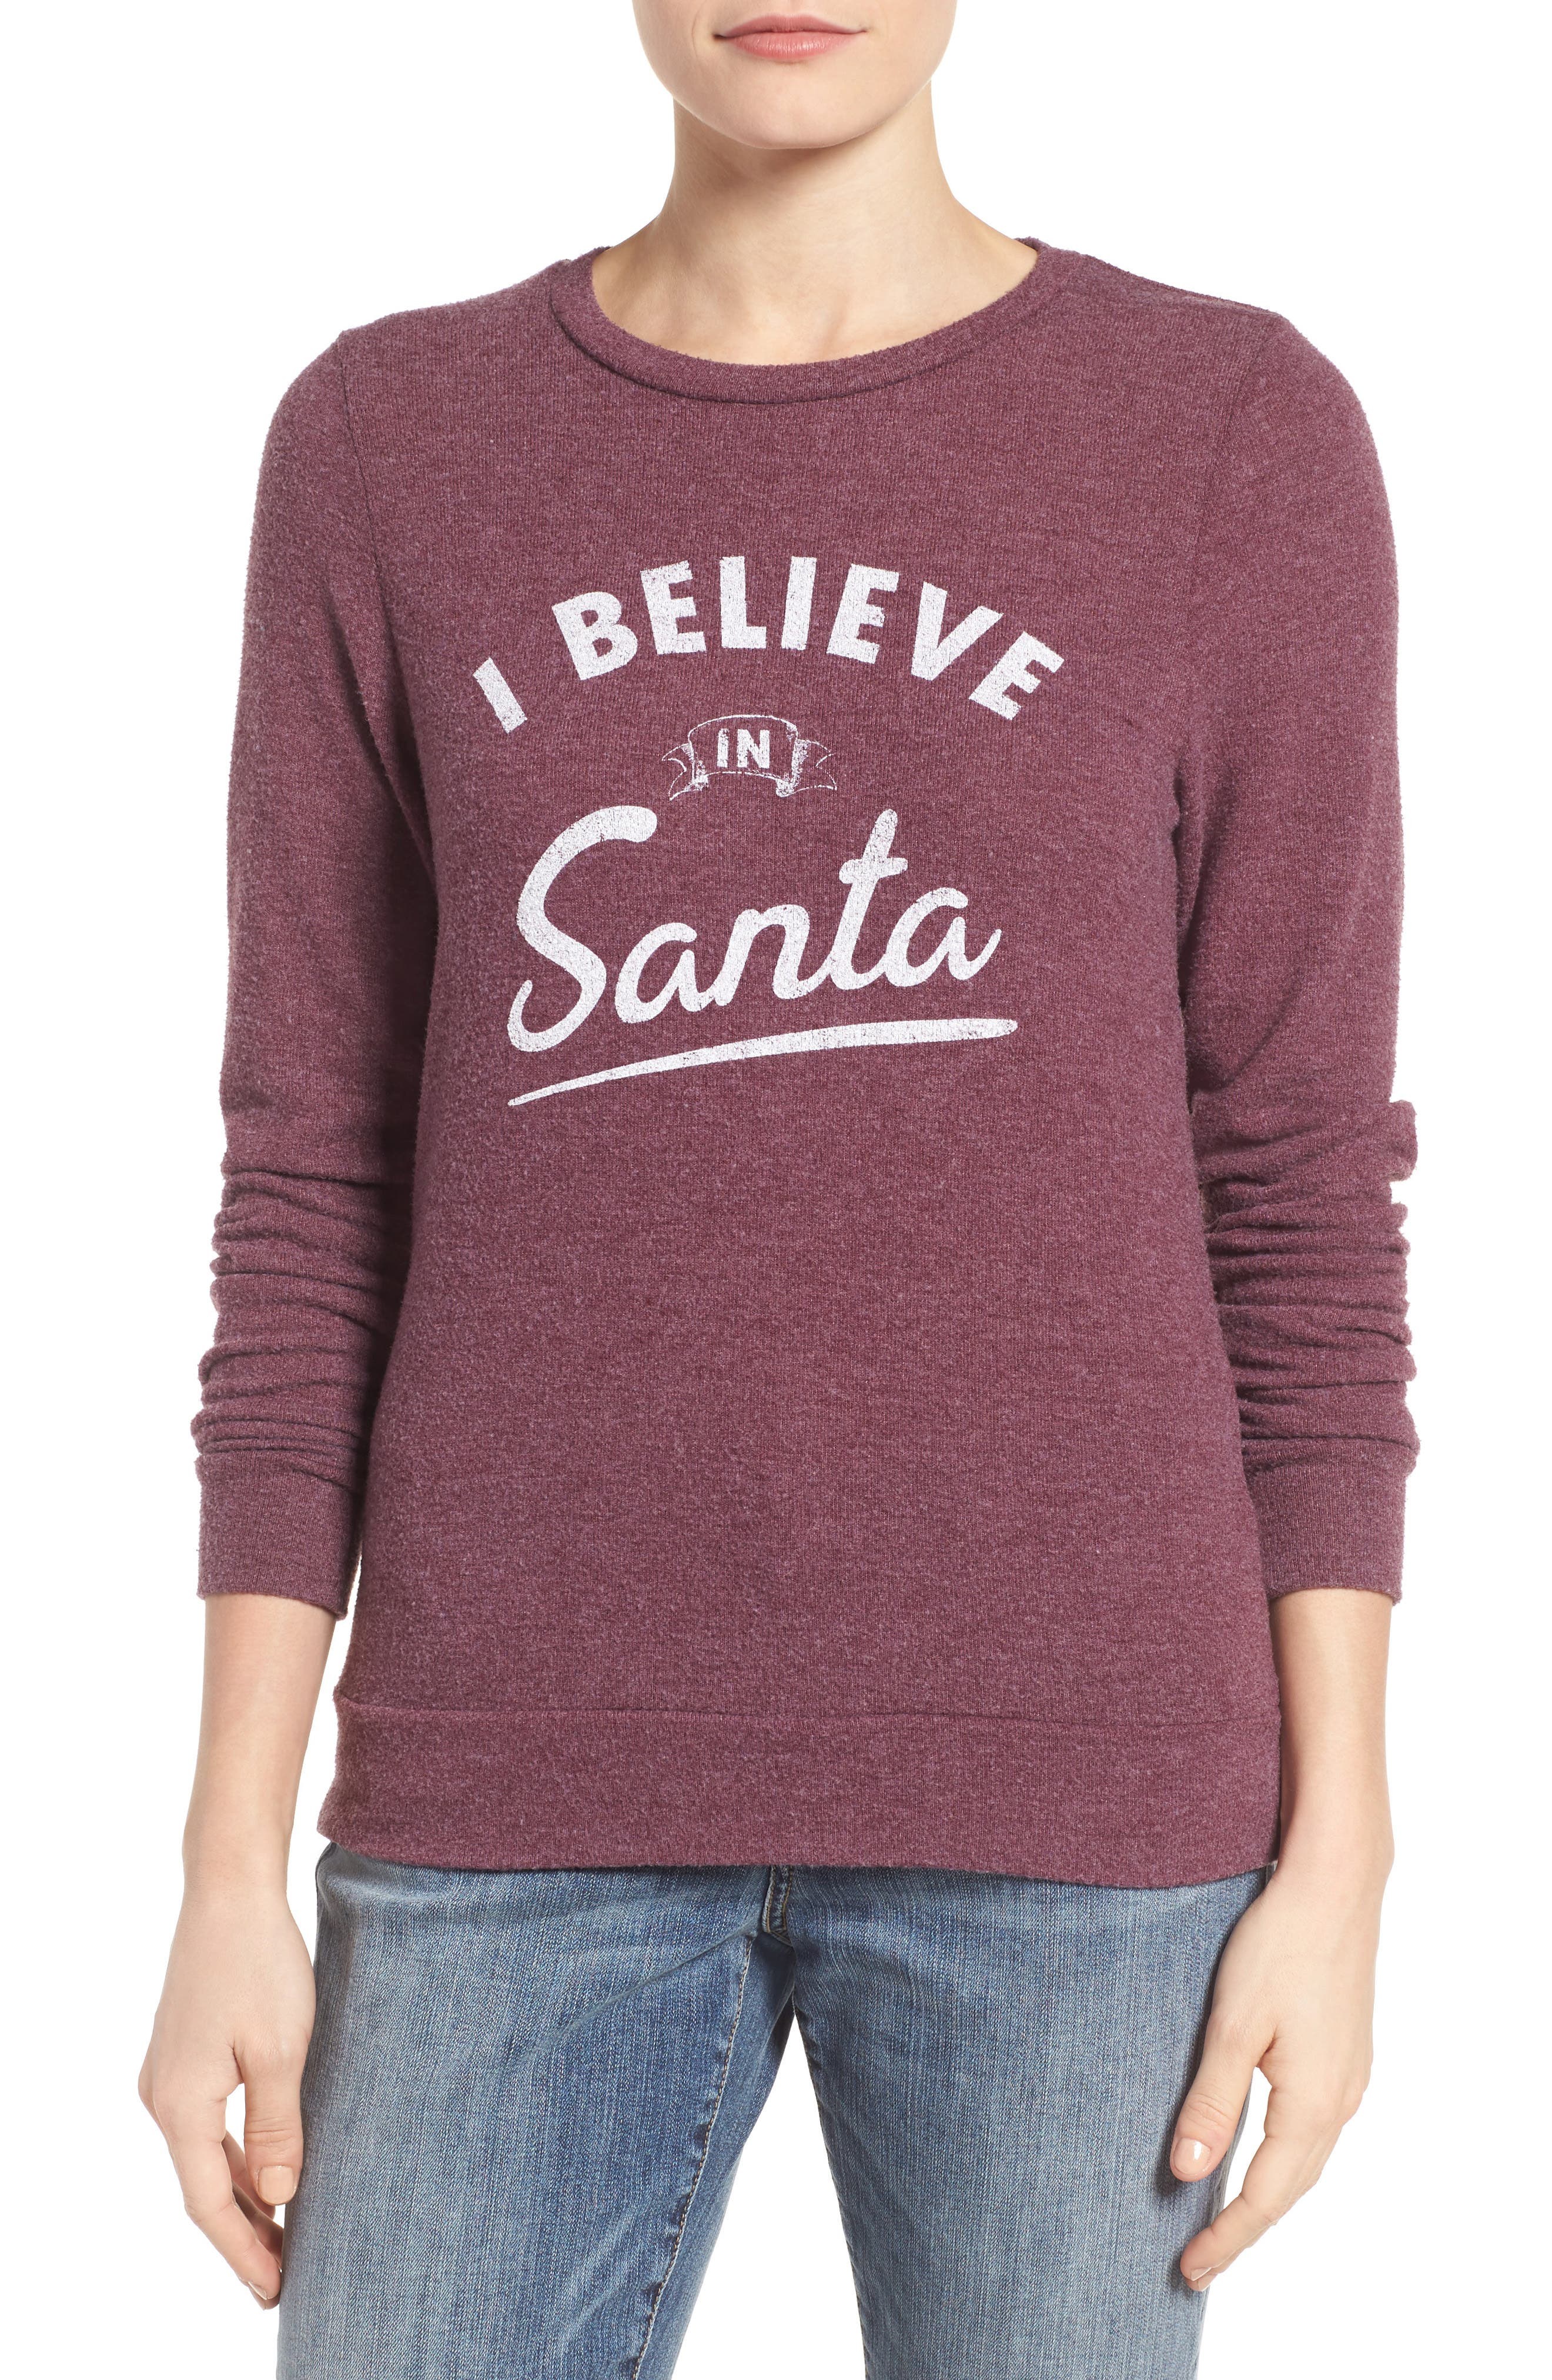 I Believe in Santa Sweatshirt,                             Main thumbnail 1, color,                             930